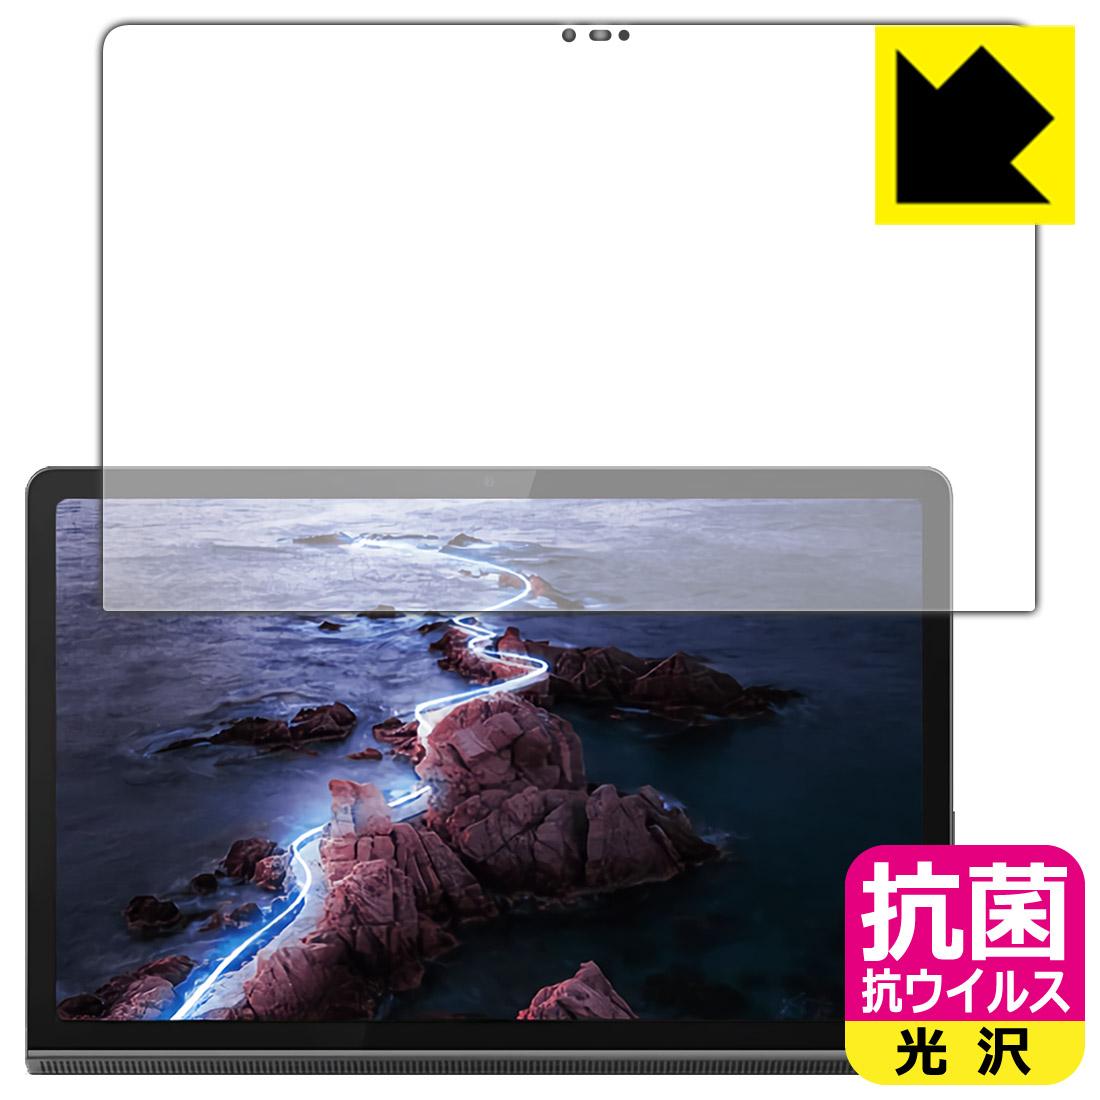 <title>抗菌 抗ウイルス 光沢 Lenovo Yoga Tab 11 専用保護フィルム 保護シート 受注生産品 保護フィルム smtb-kd</title>